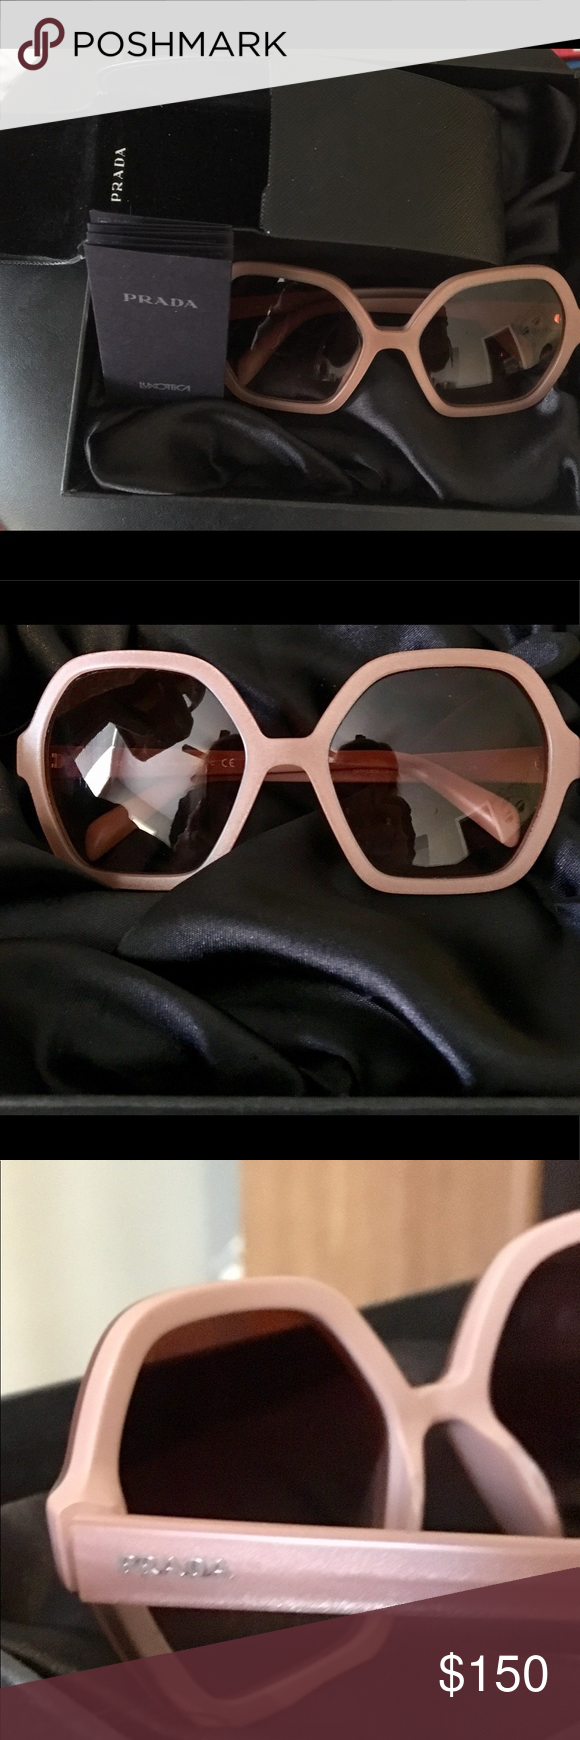 0006ceccabc ... canada new prada pr 06ssf sunglasses includes certificate of  authenticity and original case. feel free